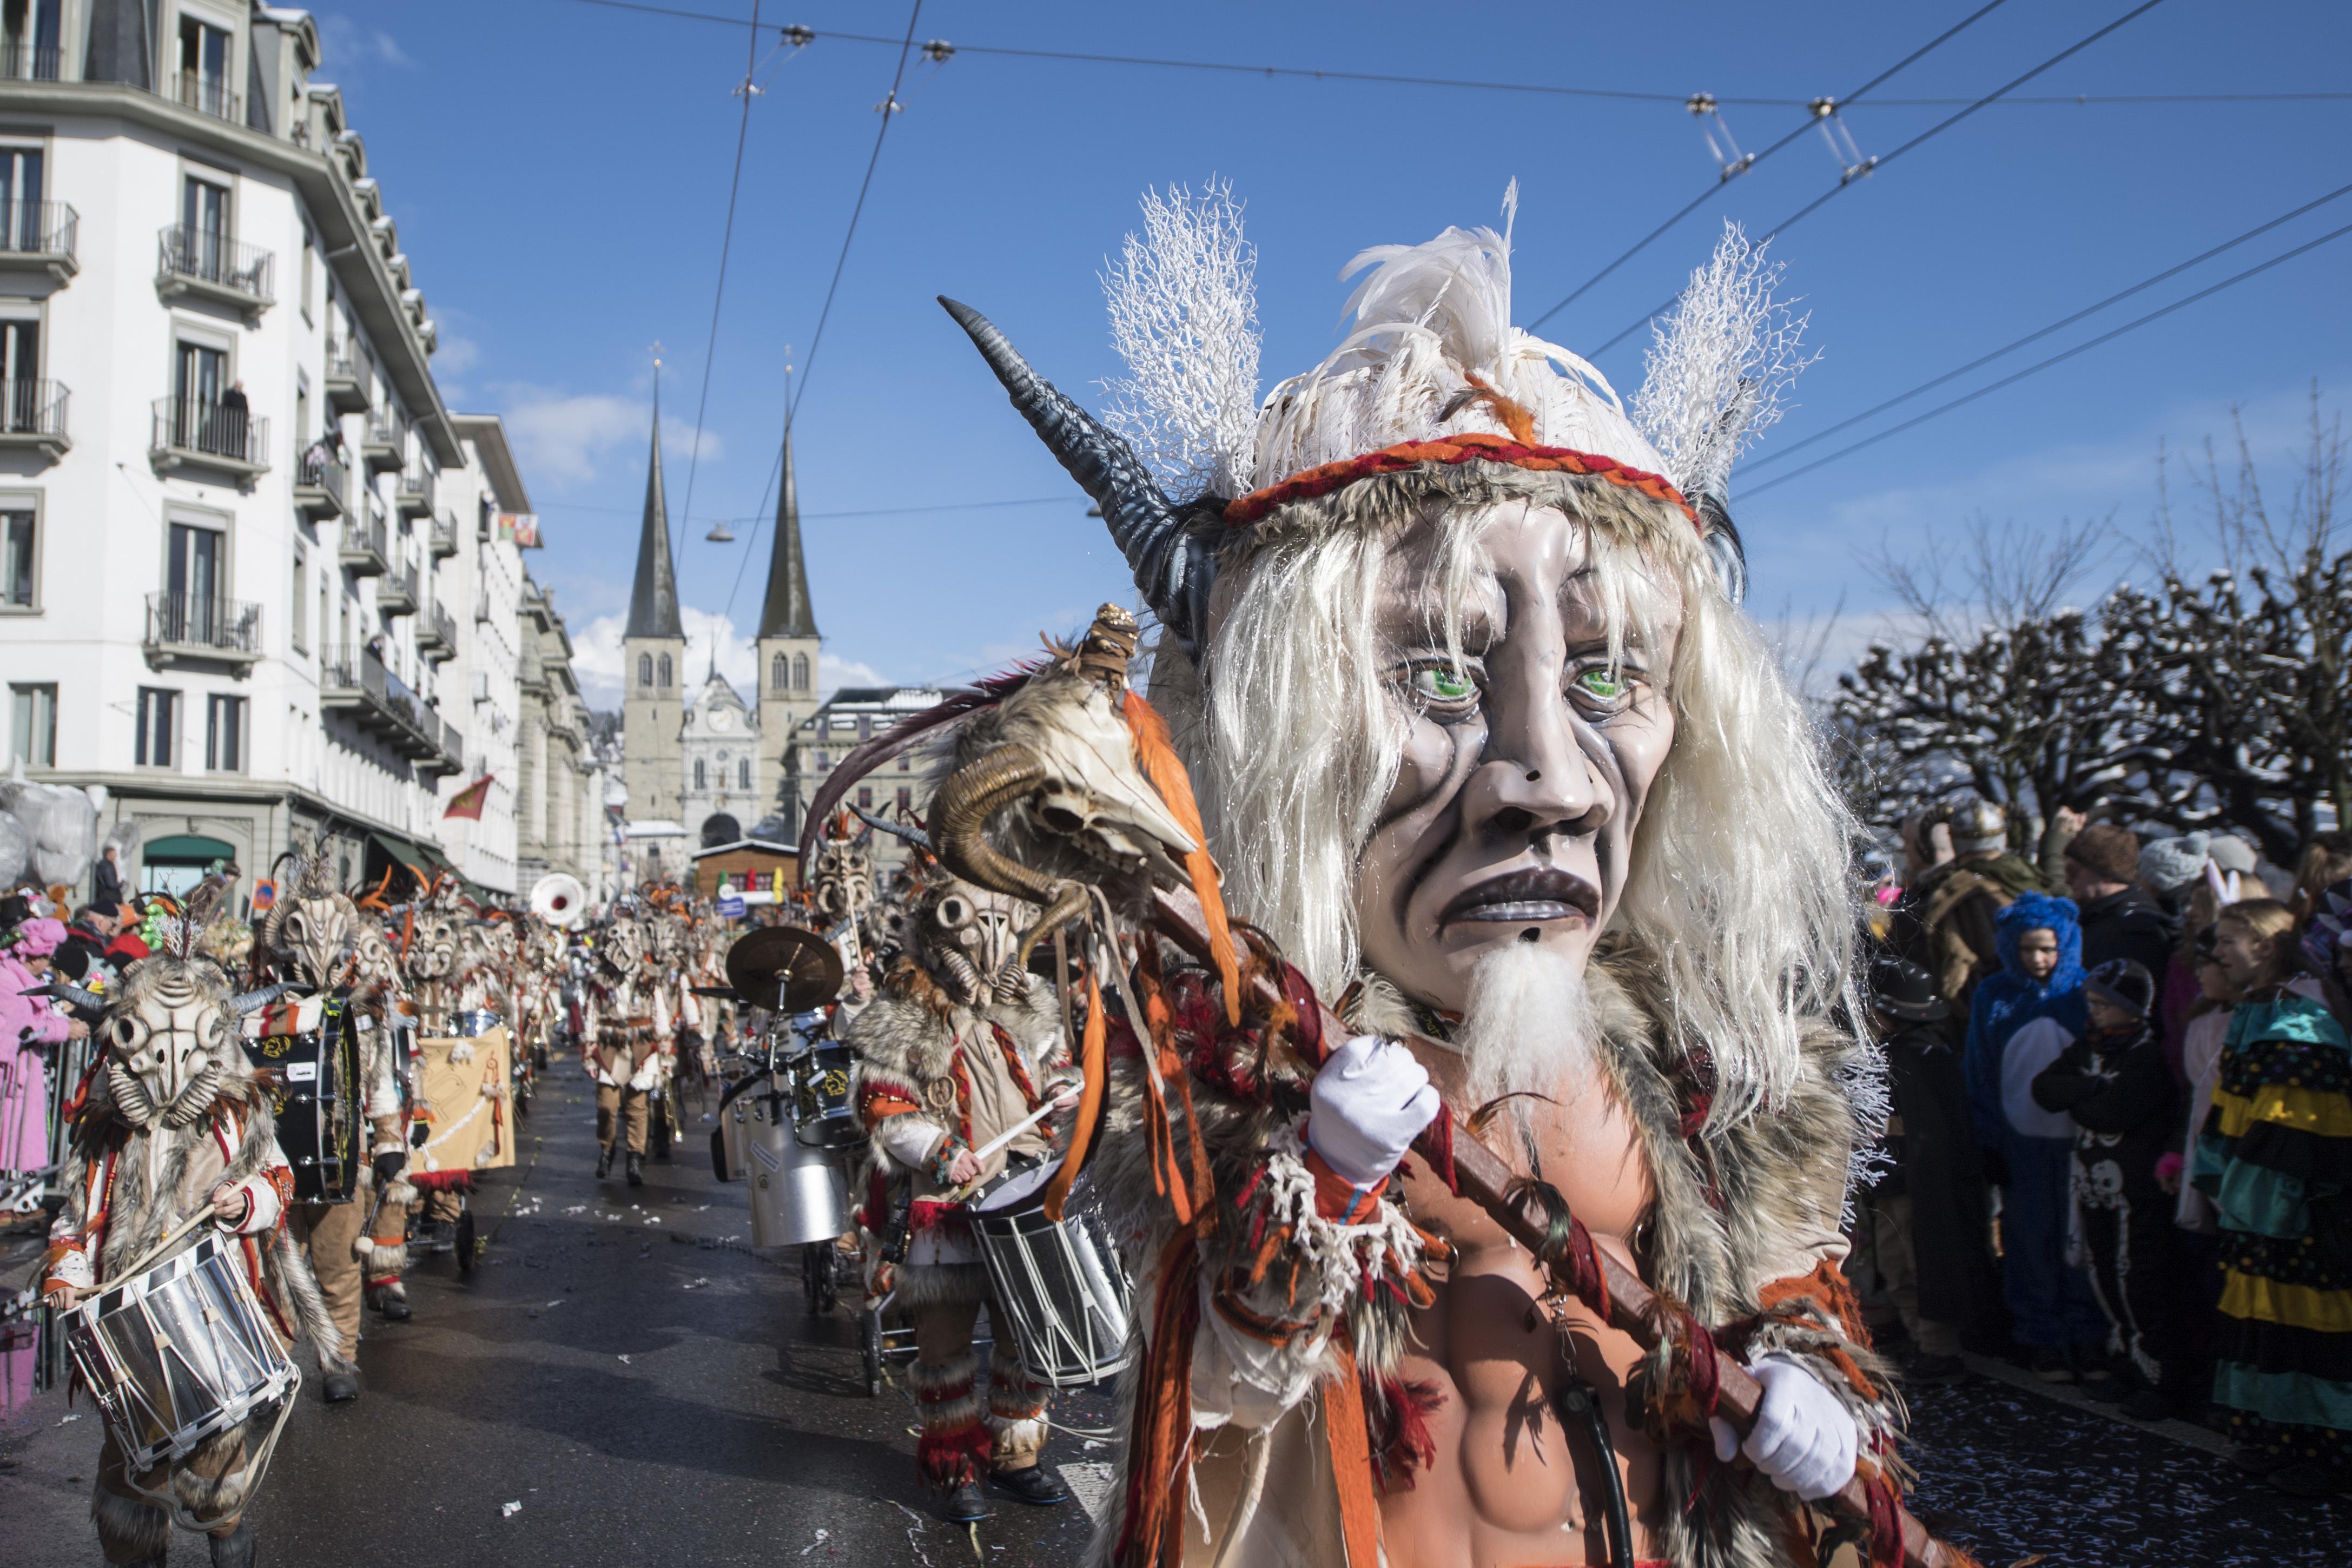 Masked revelers parade through the streets during the the carnival season in Lucerne, Switzerland, Monday, Feb. 12, 2018. (Urs Flueeler/Keystone via AP)